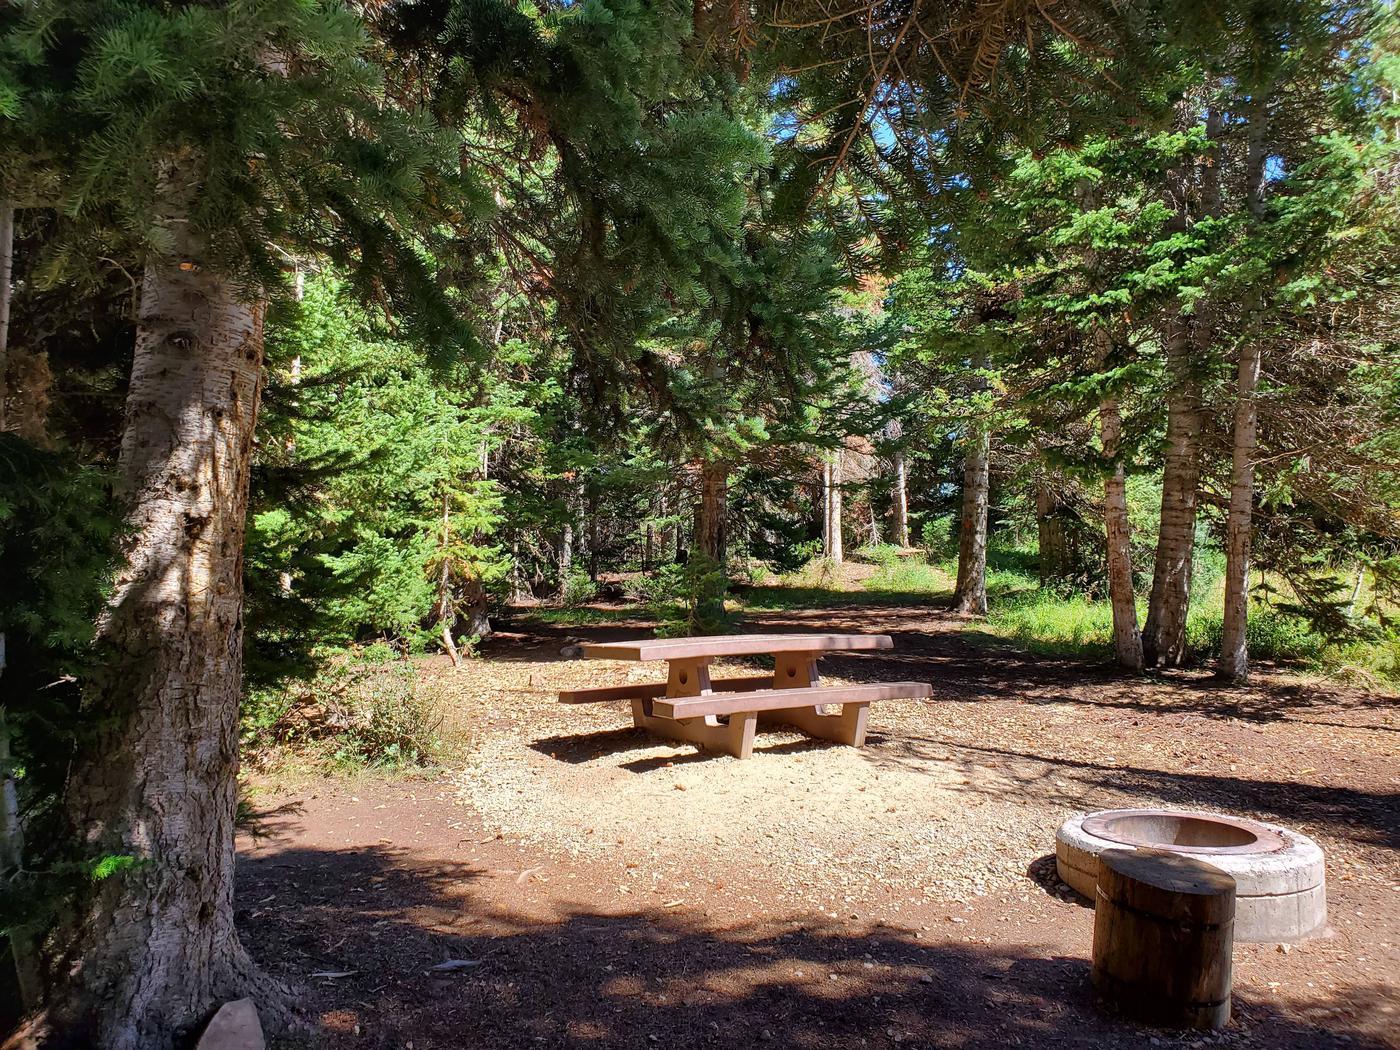 Lake Canyon Campground  - Site 13Lake Canyon Campground - Site 13